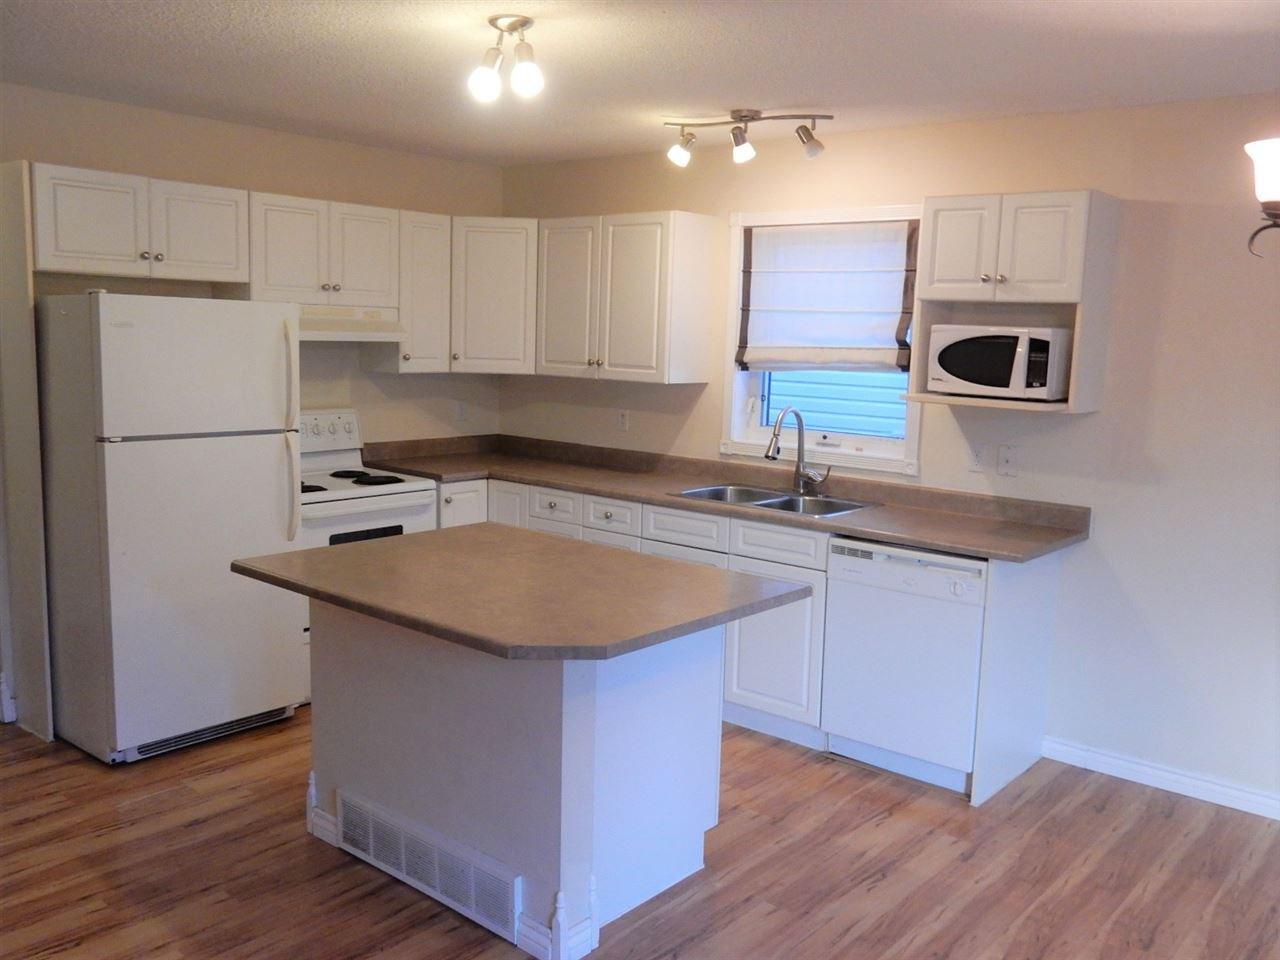 Photo 2: Photos: 3443 McKay Lane in Edmonton: Zone 55 House Half Duplex for sale : MLS®# E4173243